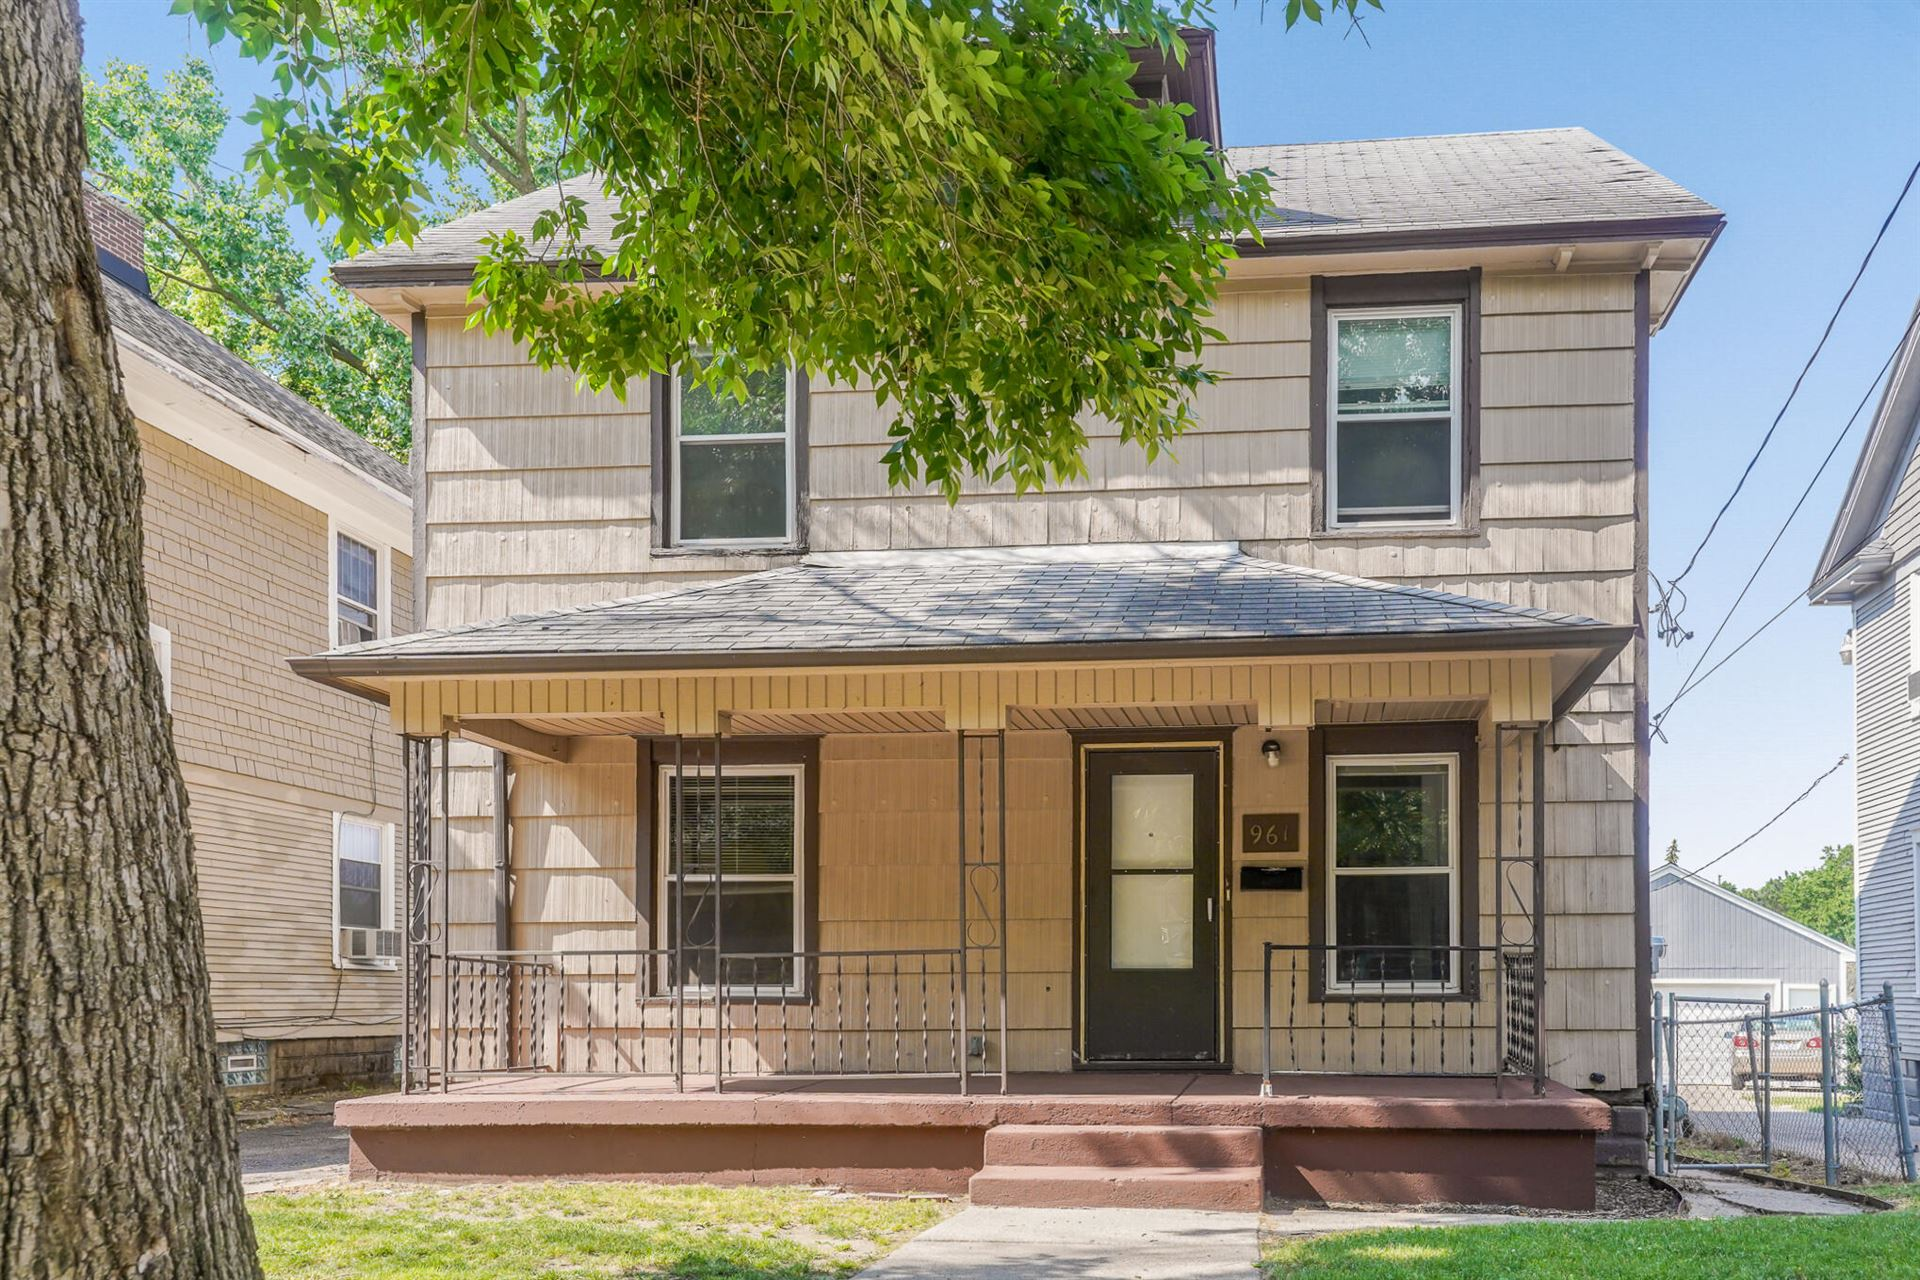 961 Dunham Street SE, Grand Rapids, MI 49506 - MLS#: 21022462